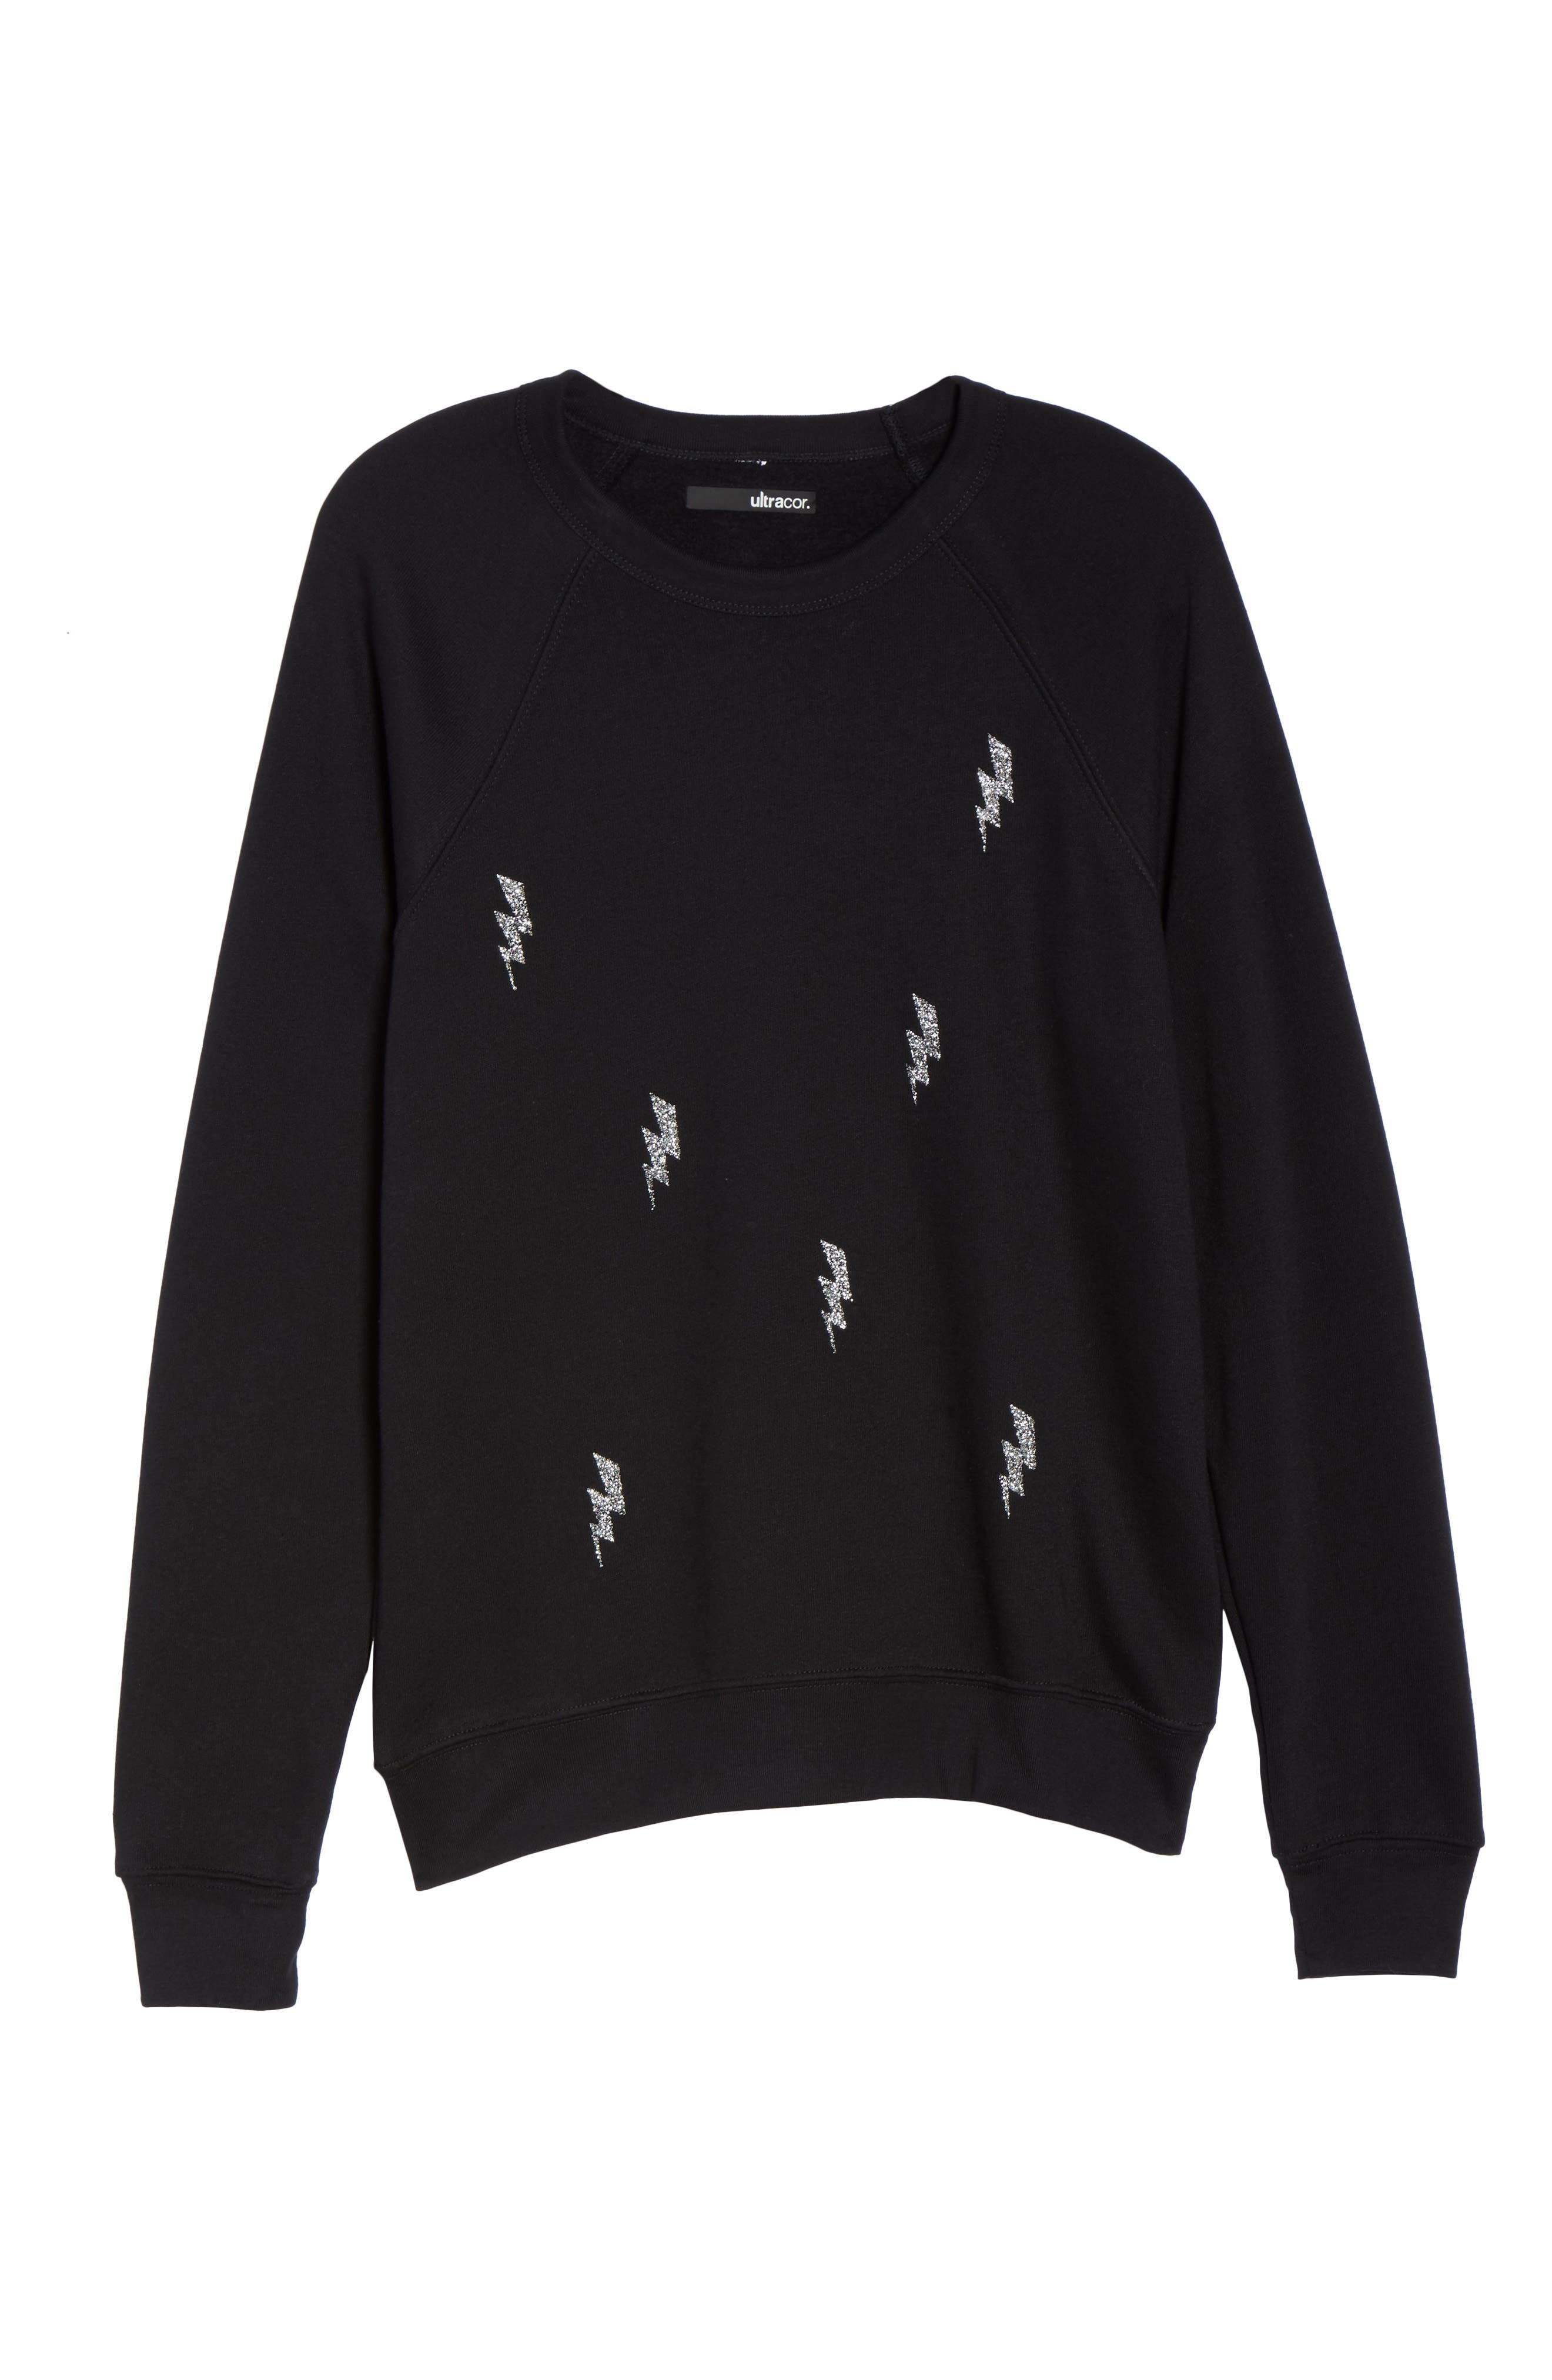 Swarovski Bolt Sweatshirt,                             Alternate thumbnail 7, color,                             001